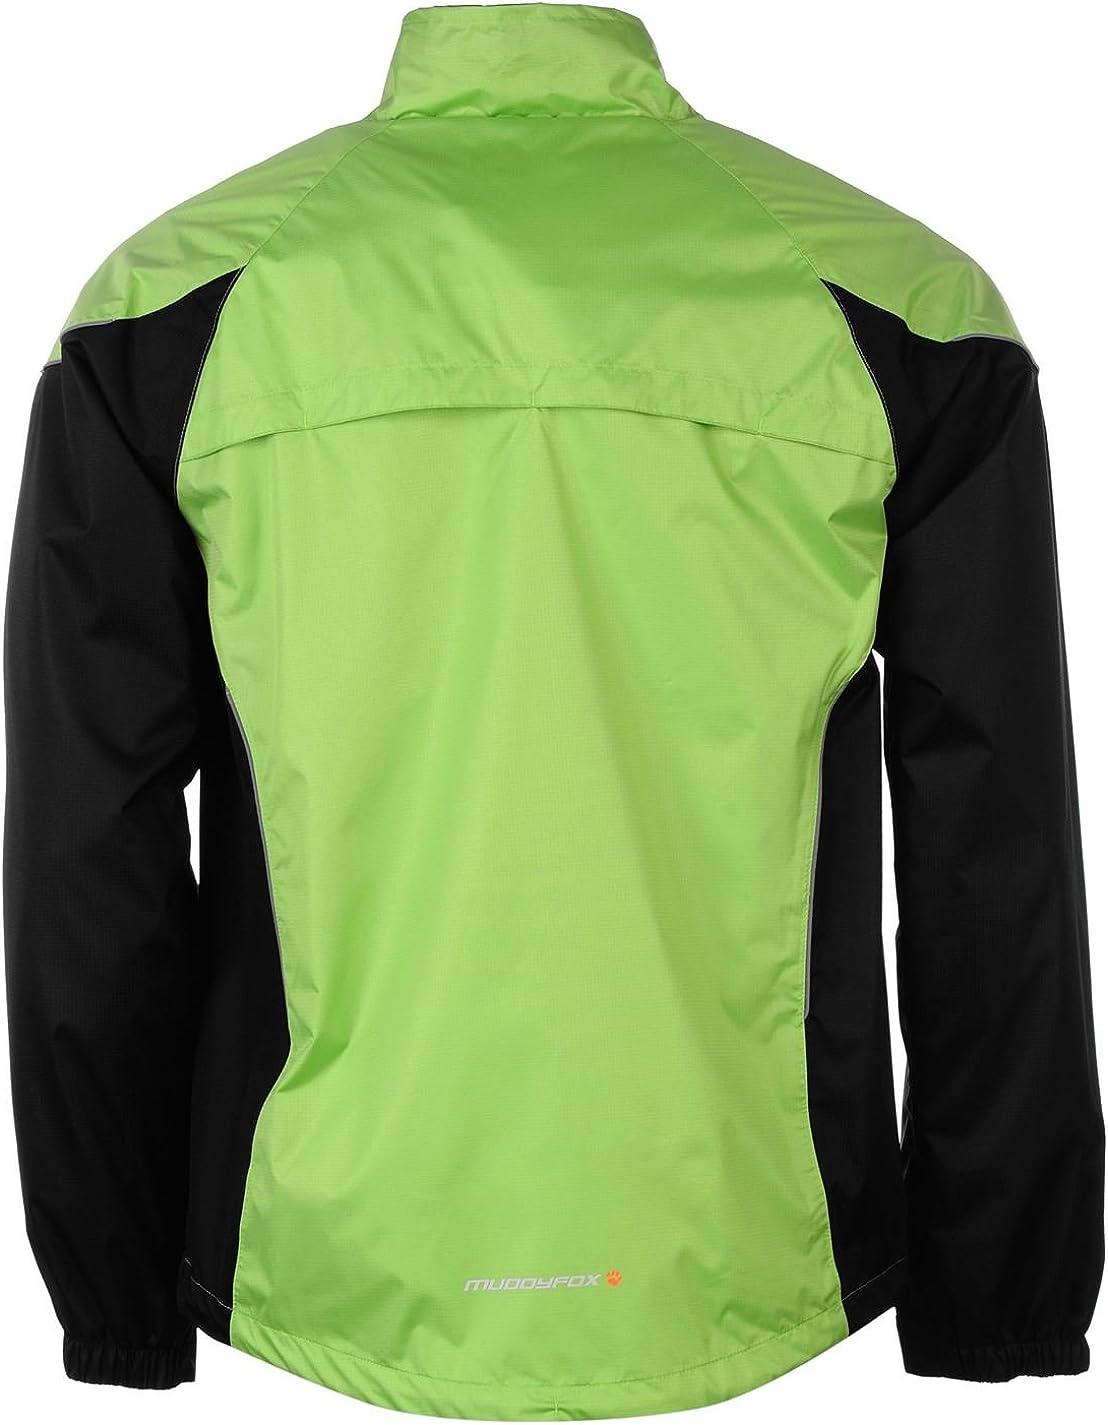 Muddyfox Mens Cycle Jacket Cycling Chest Pocket Lightweight Clothing Green//Black M